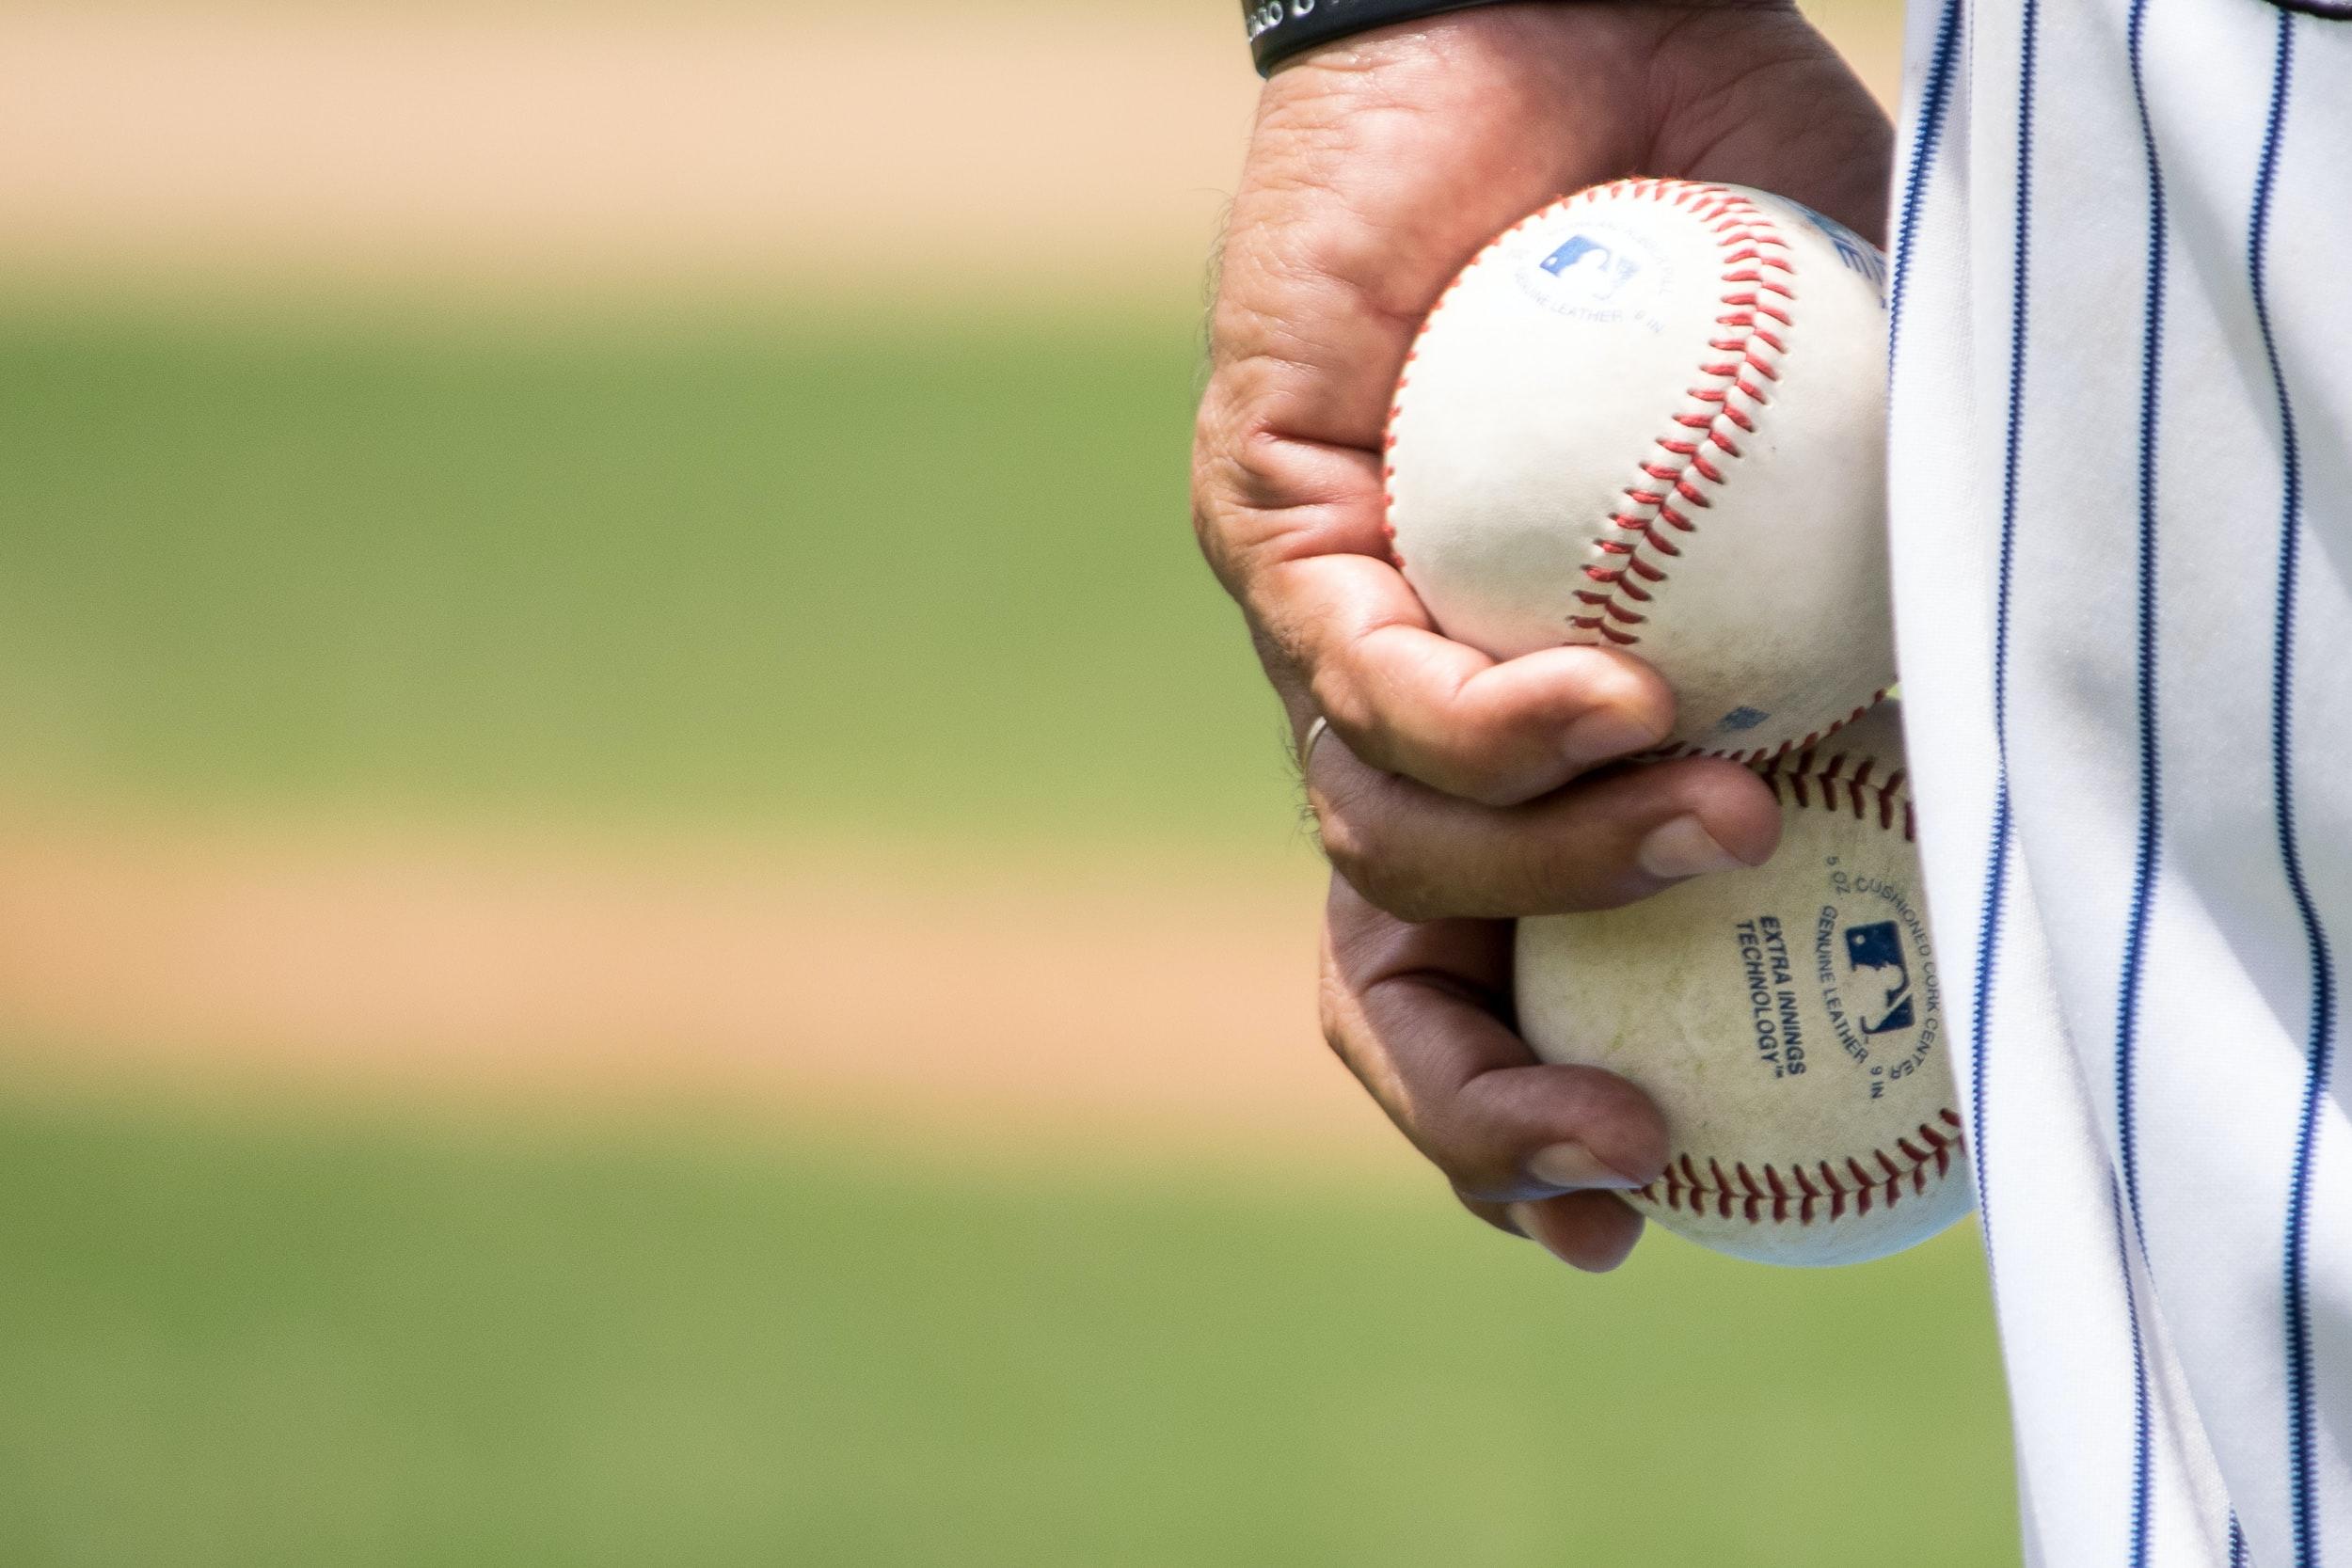 Mans hand holding to Major League Baseballs